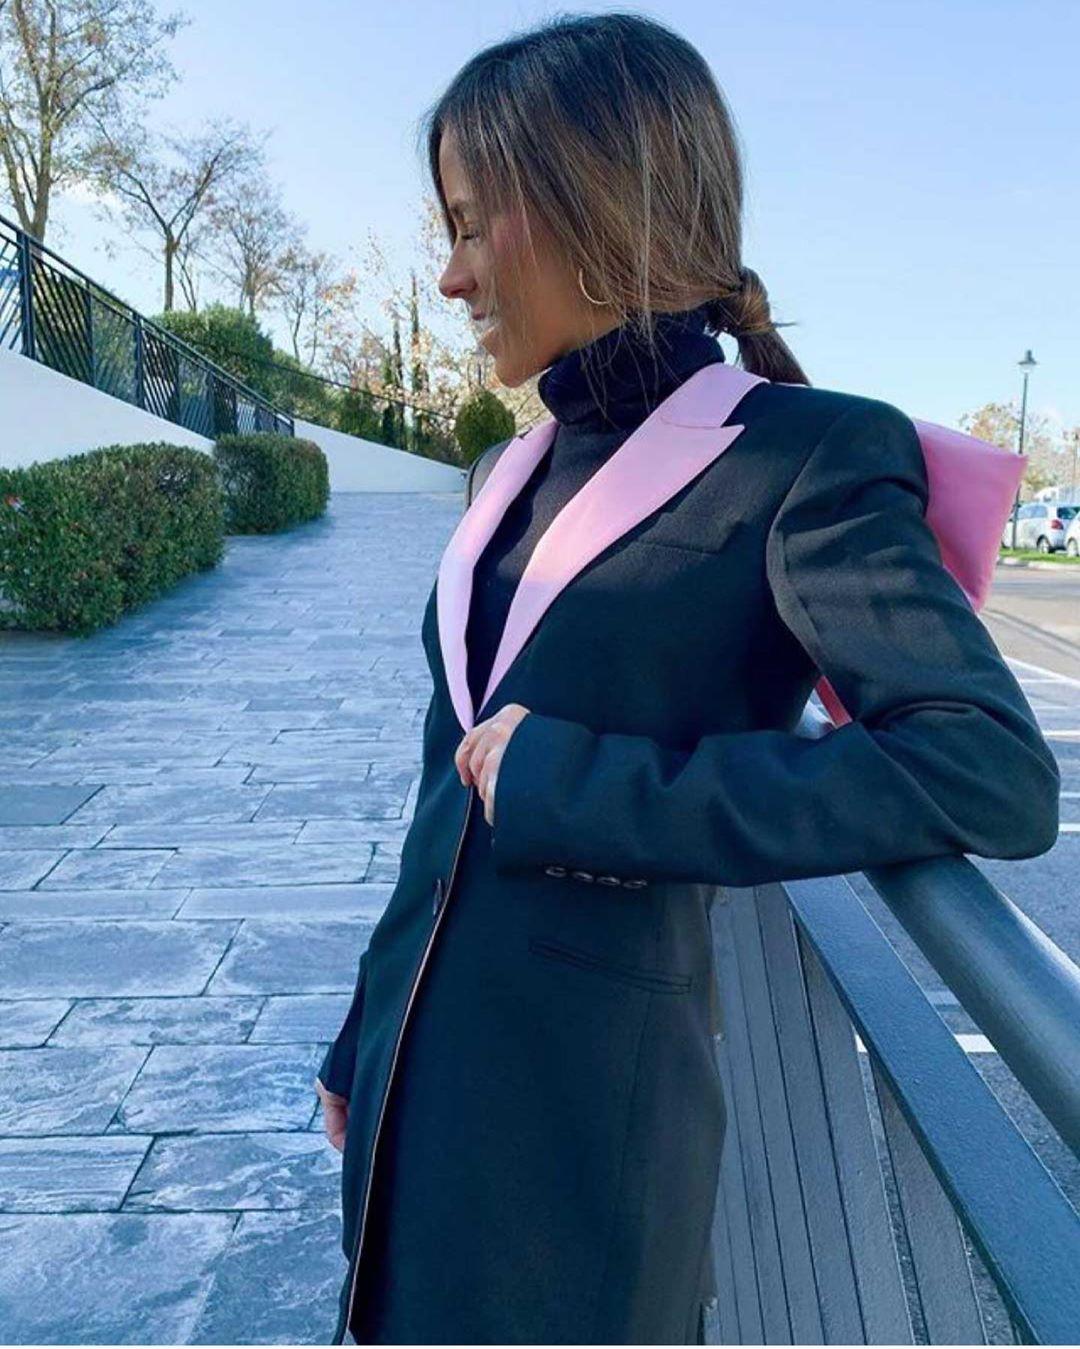 bi-aterial bow dress jacket de Zara sur zara_italy_woman